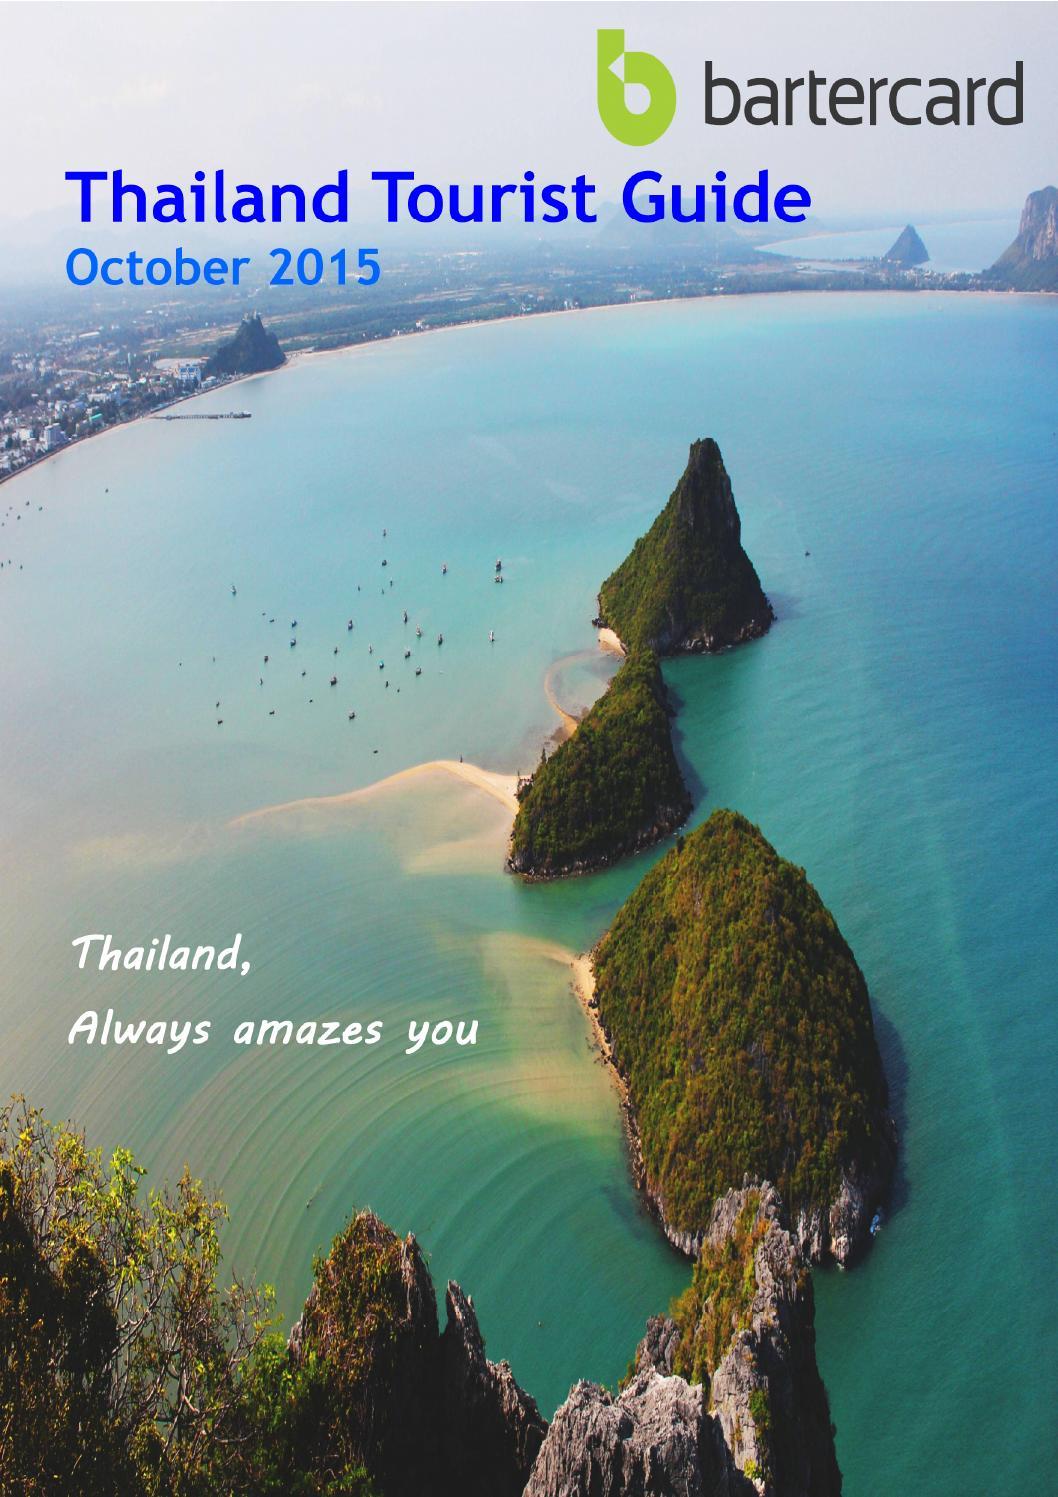 bartercard tourist guide